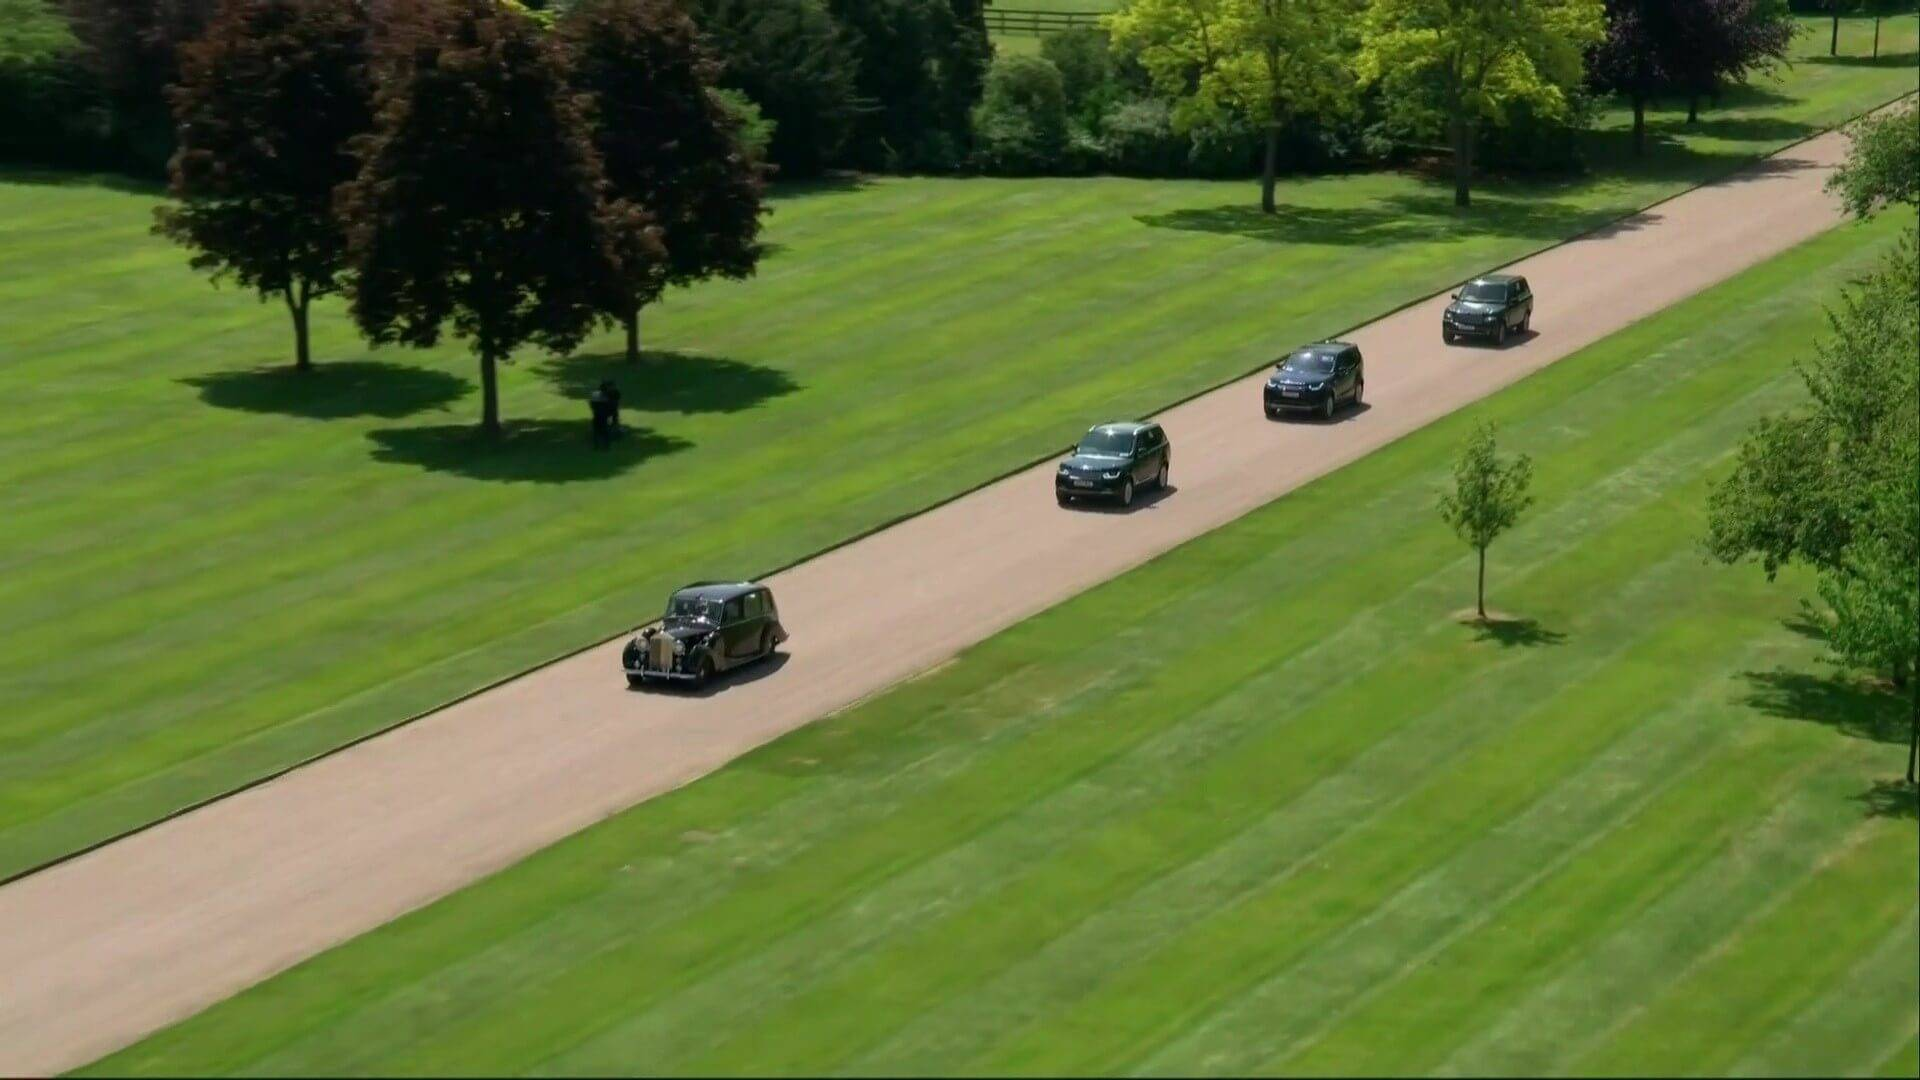 Rolls-Royce Phantom IV nunta regală (5)